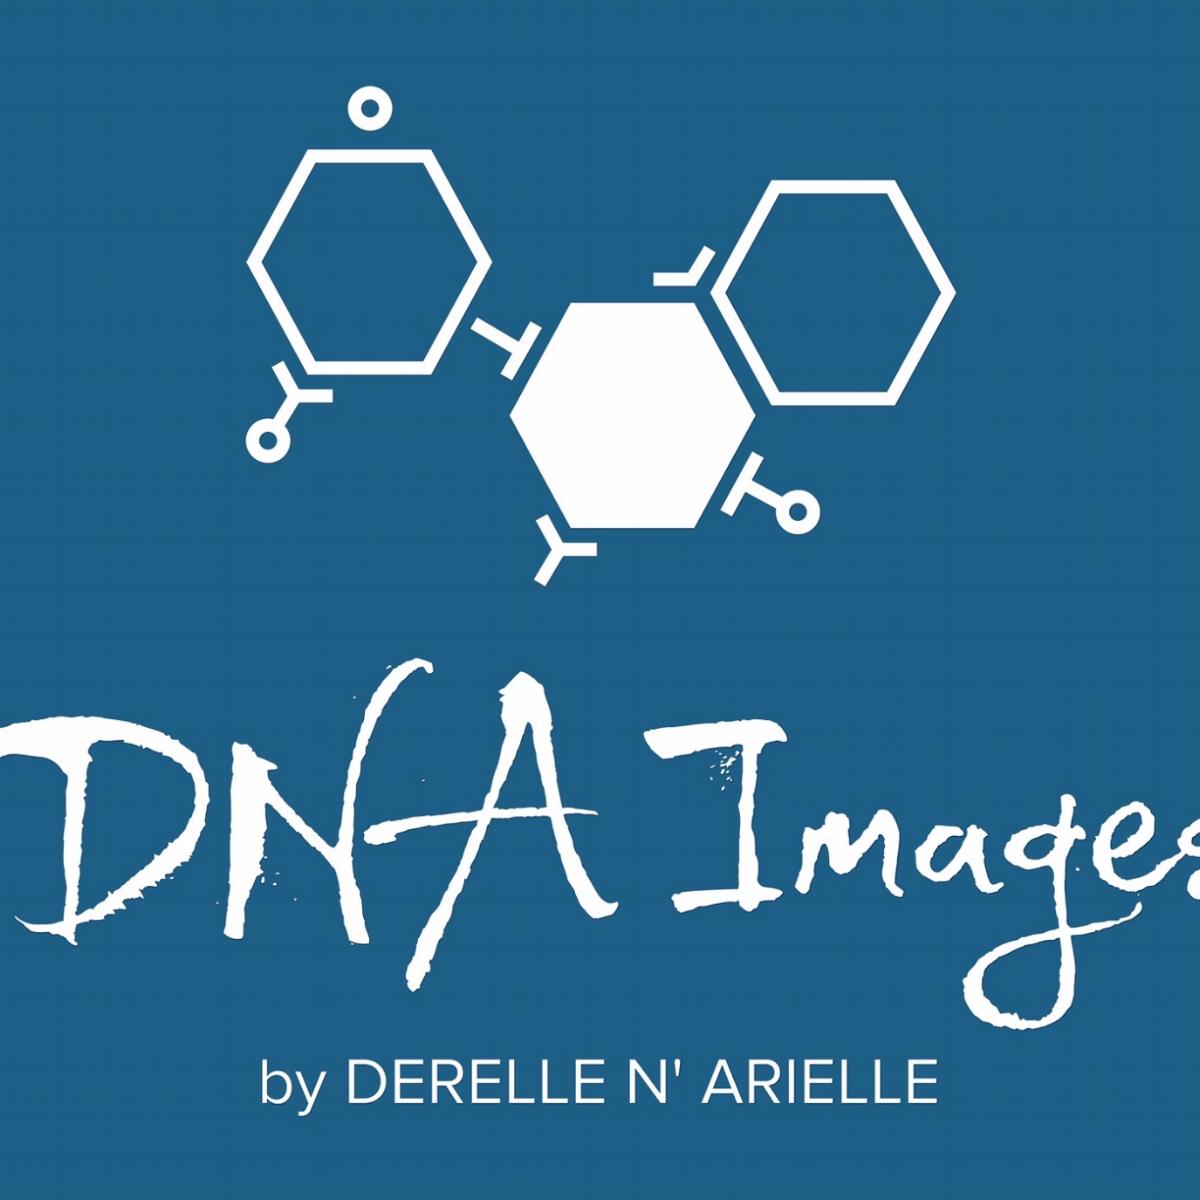 DNA Images